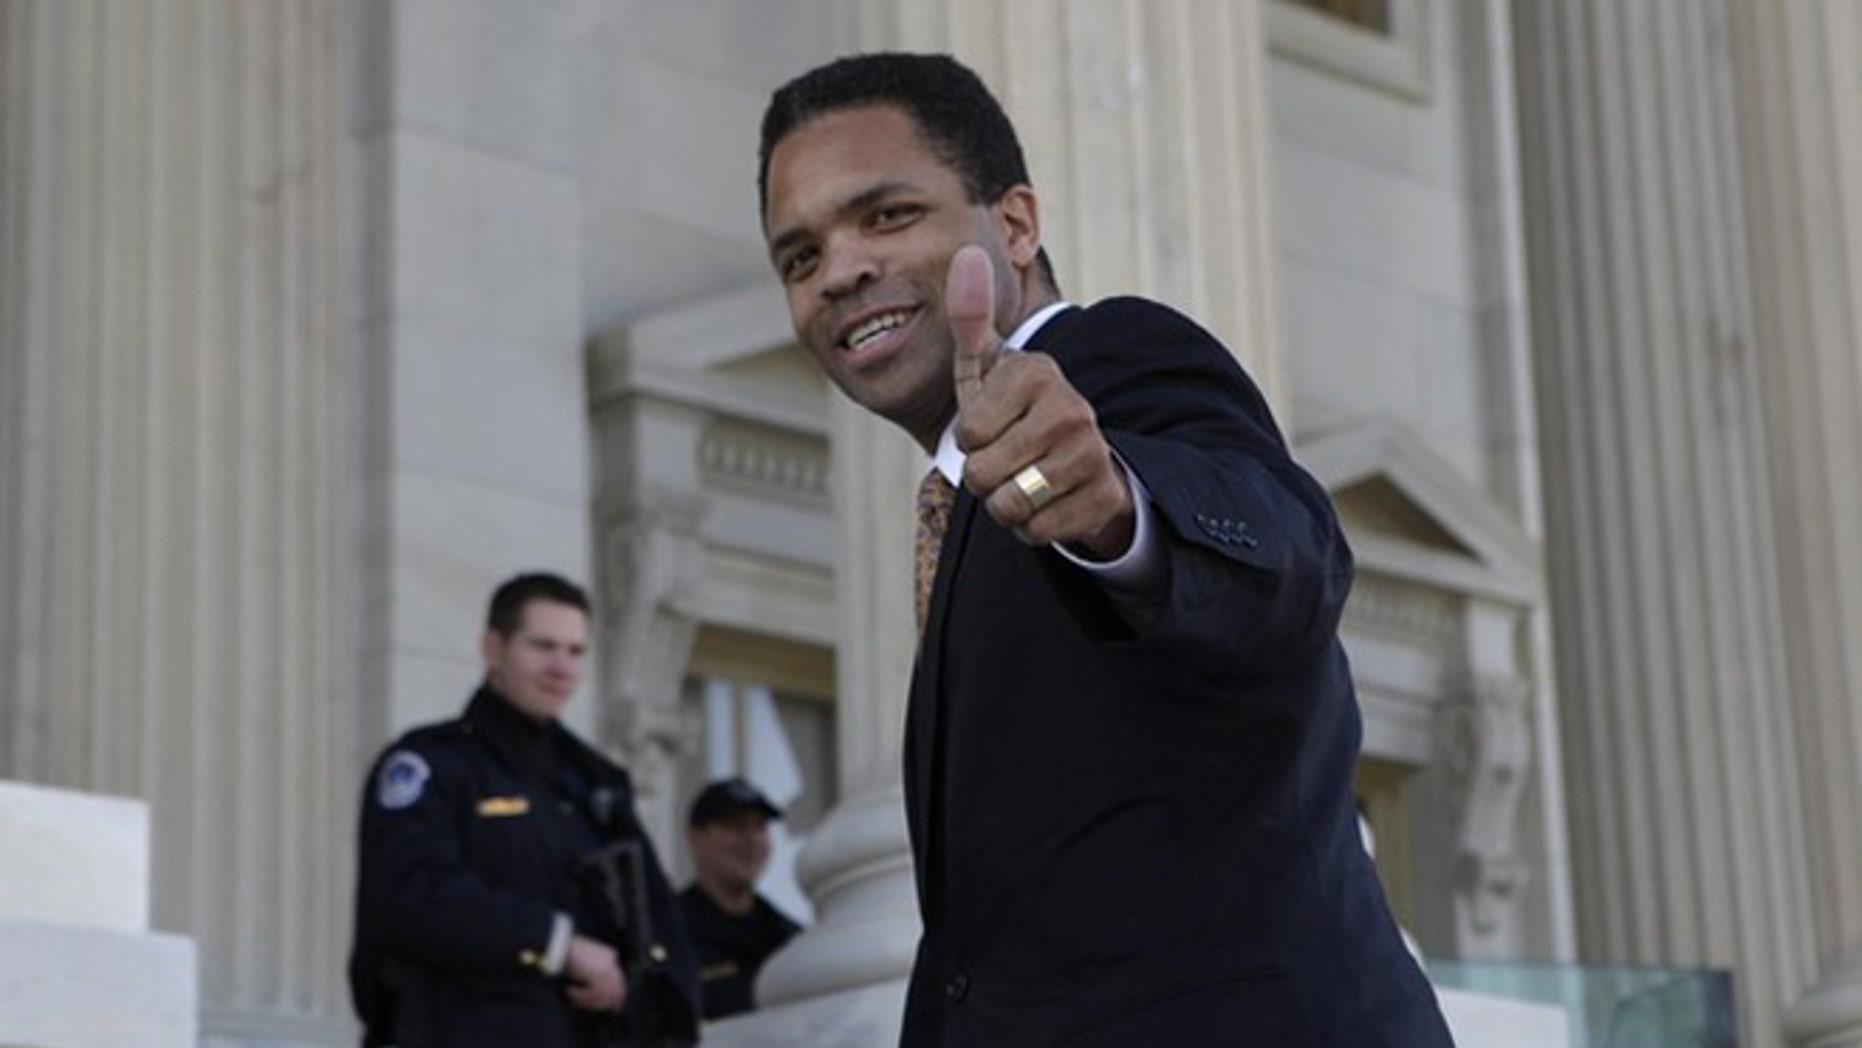 Dec. 2, 2011: Then-Rep. Jesse Jackson, Jr. walks on the U.S. Capitol steps in Washington.